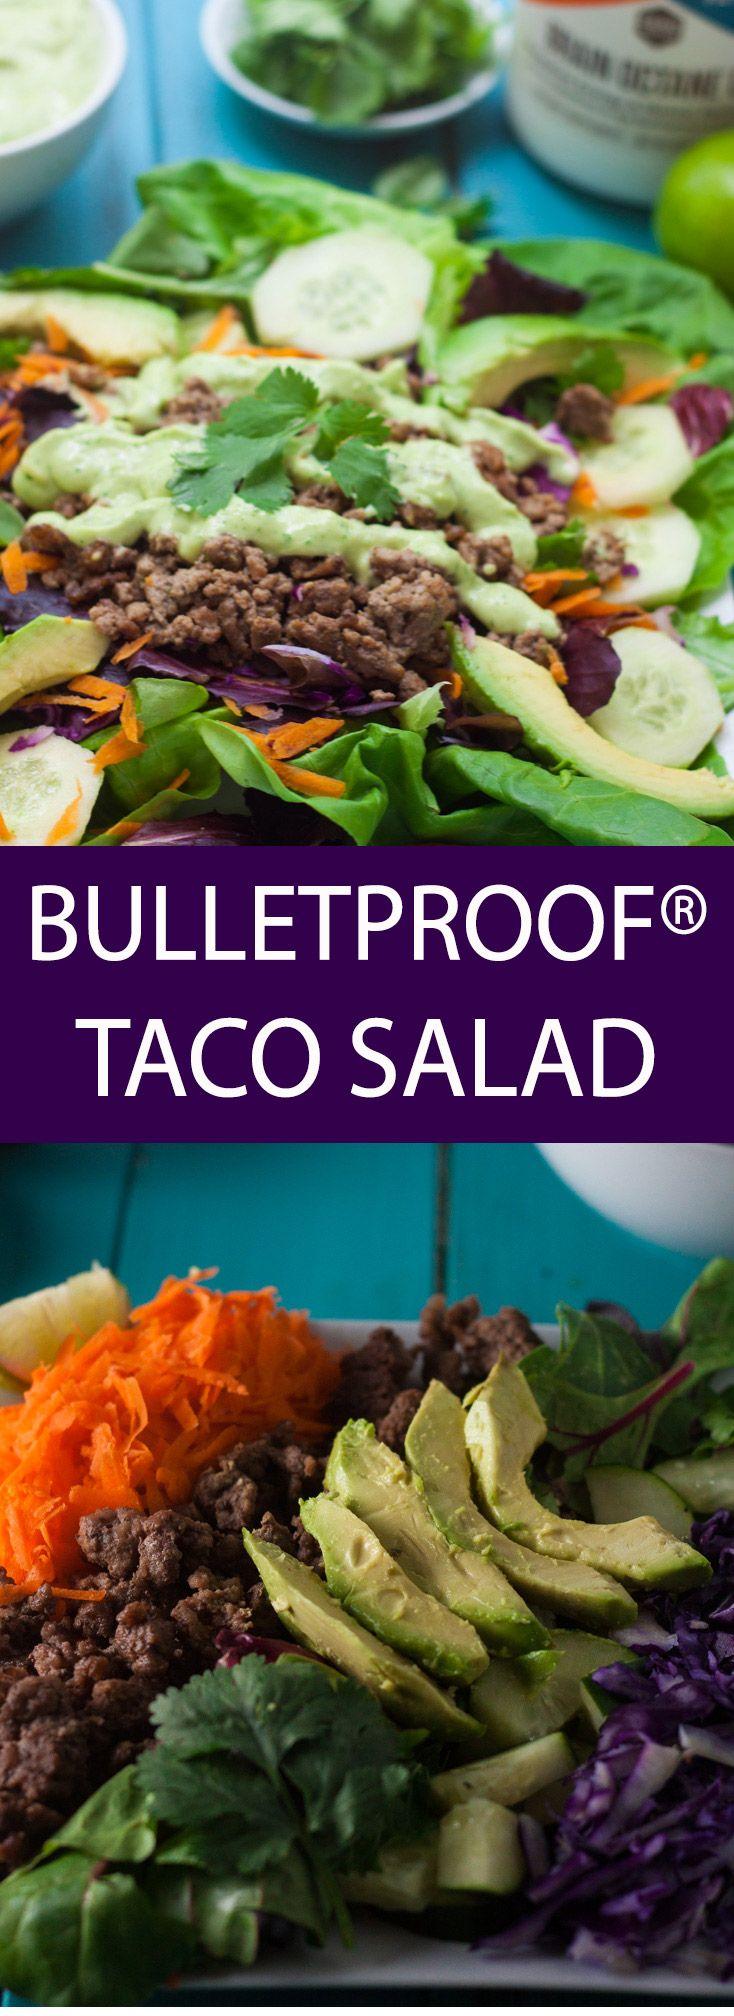 Bulletproof Taco Salad #tacosalad